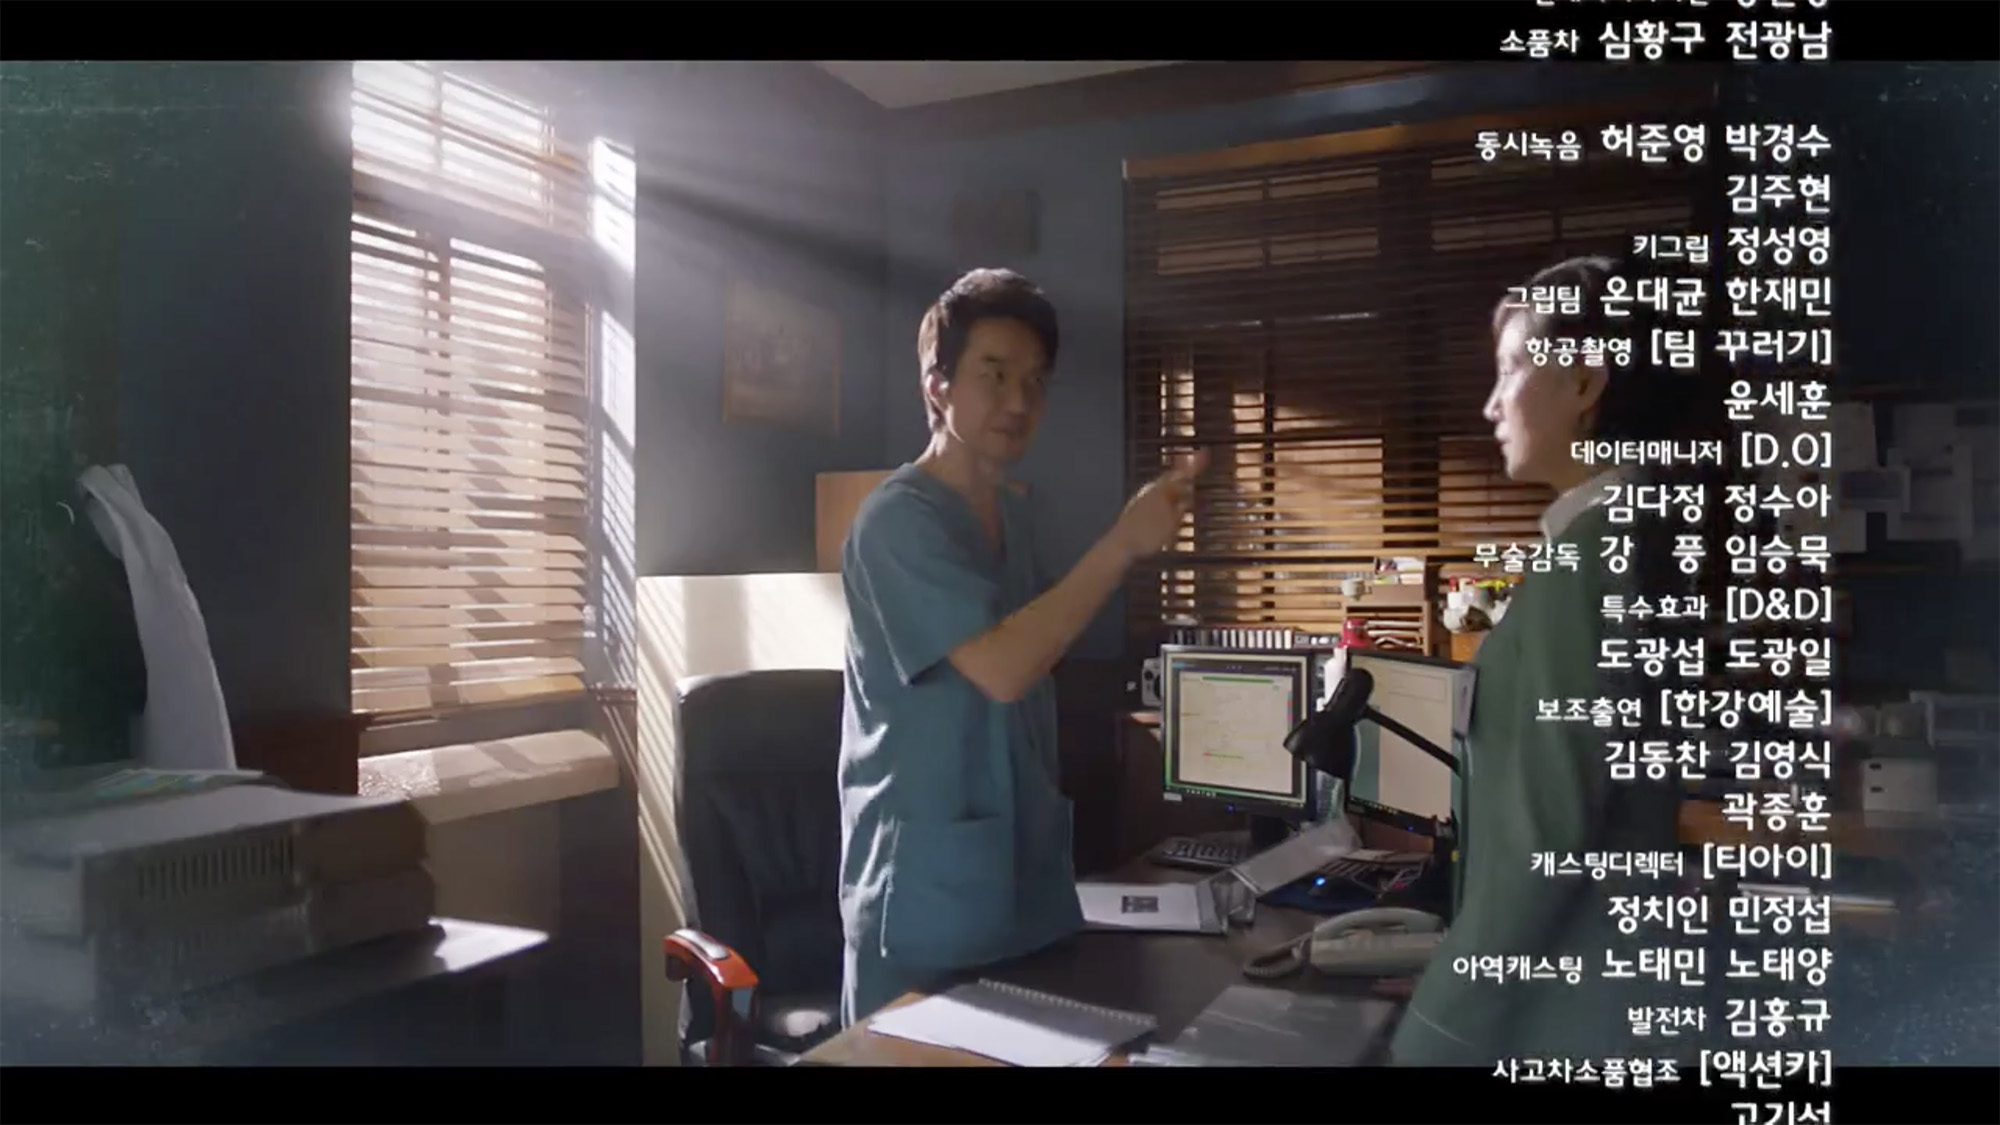 SBS 드라마 '낭만닥터 김사부 2'